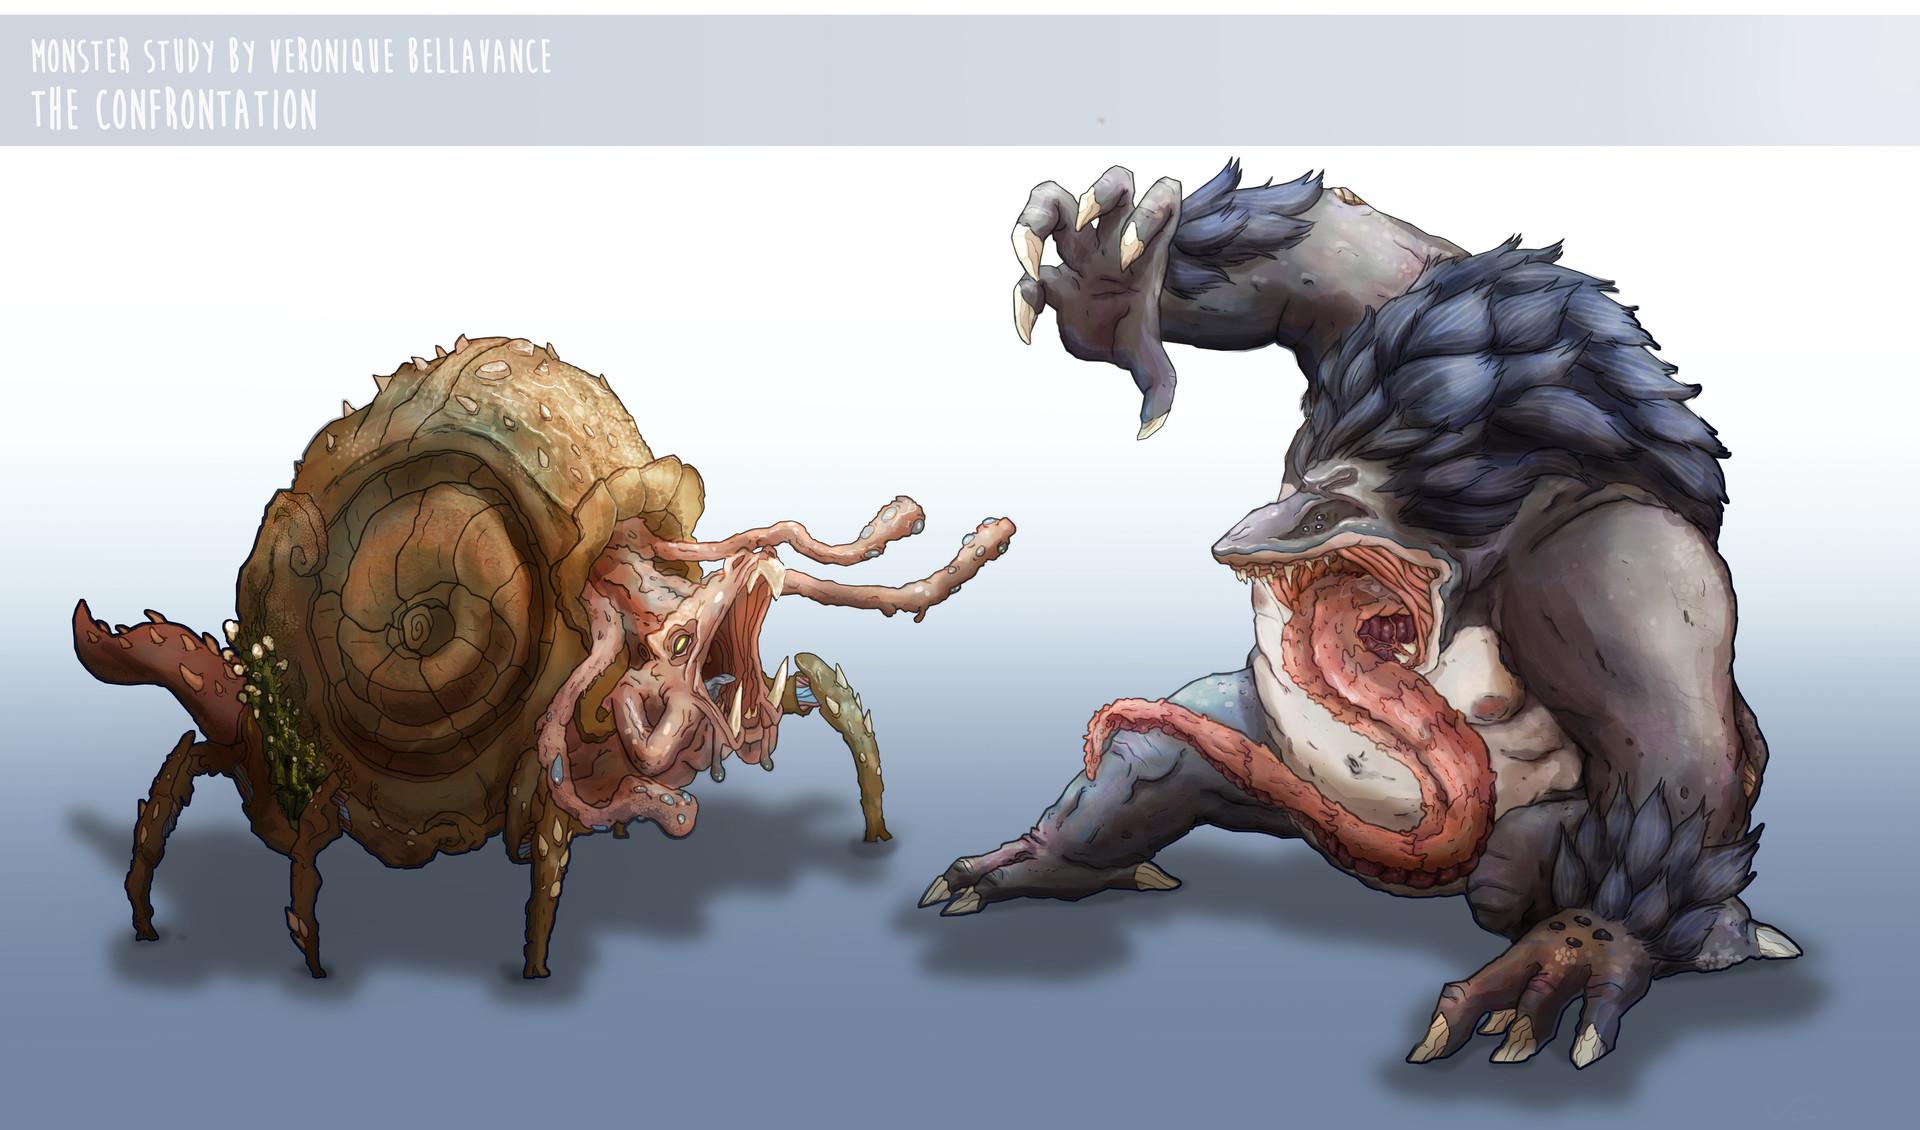 Veronique bellavance monster final